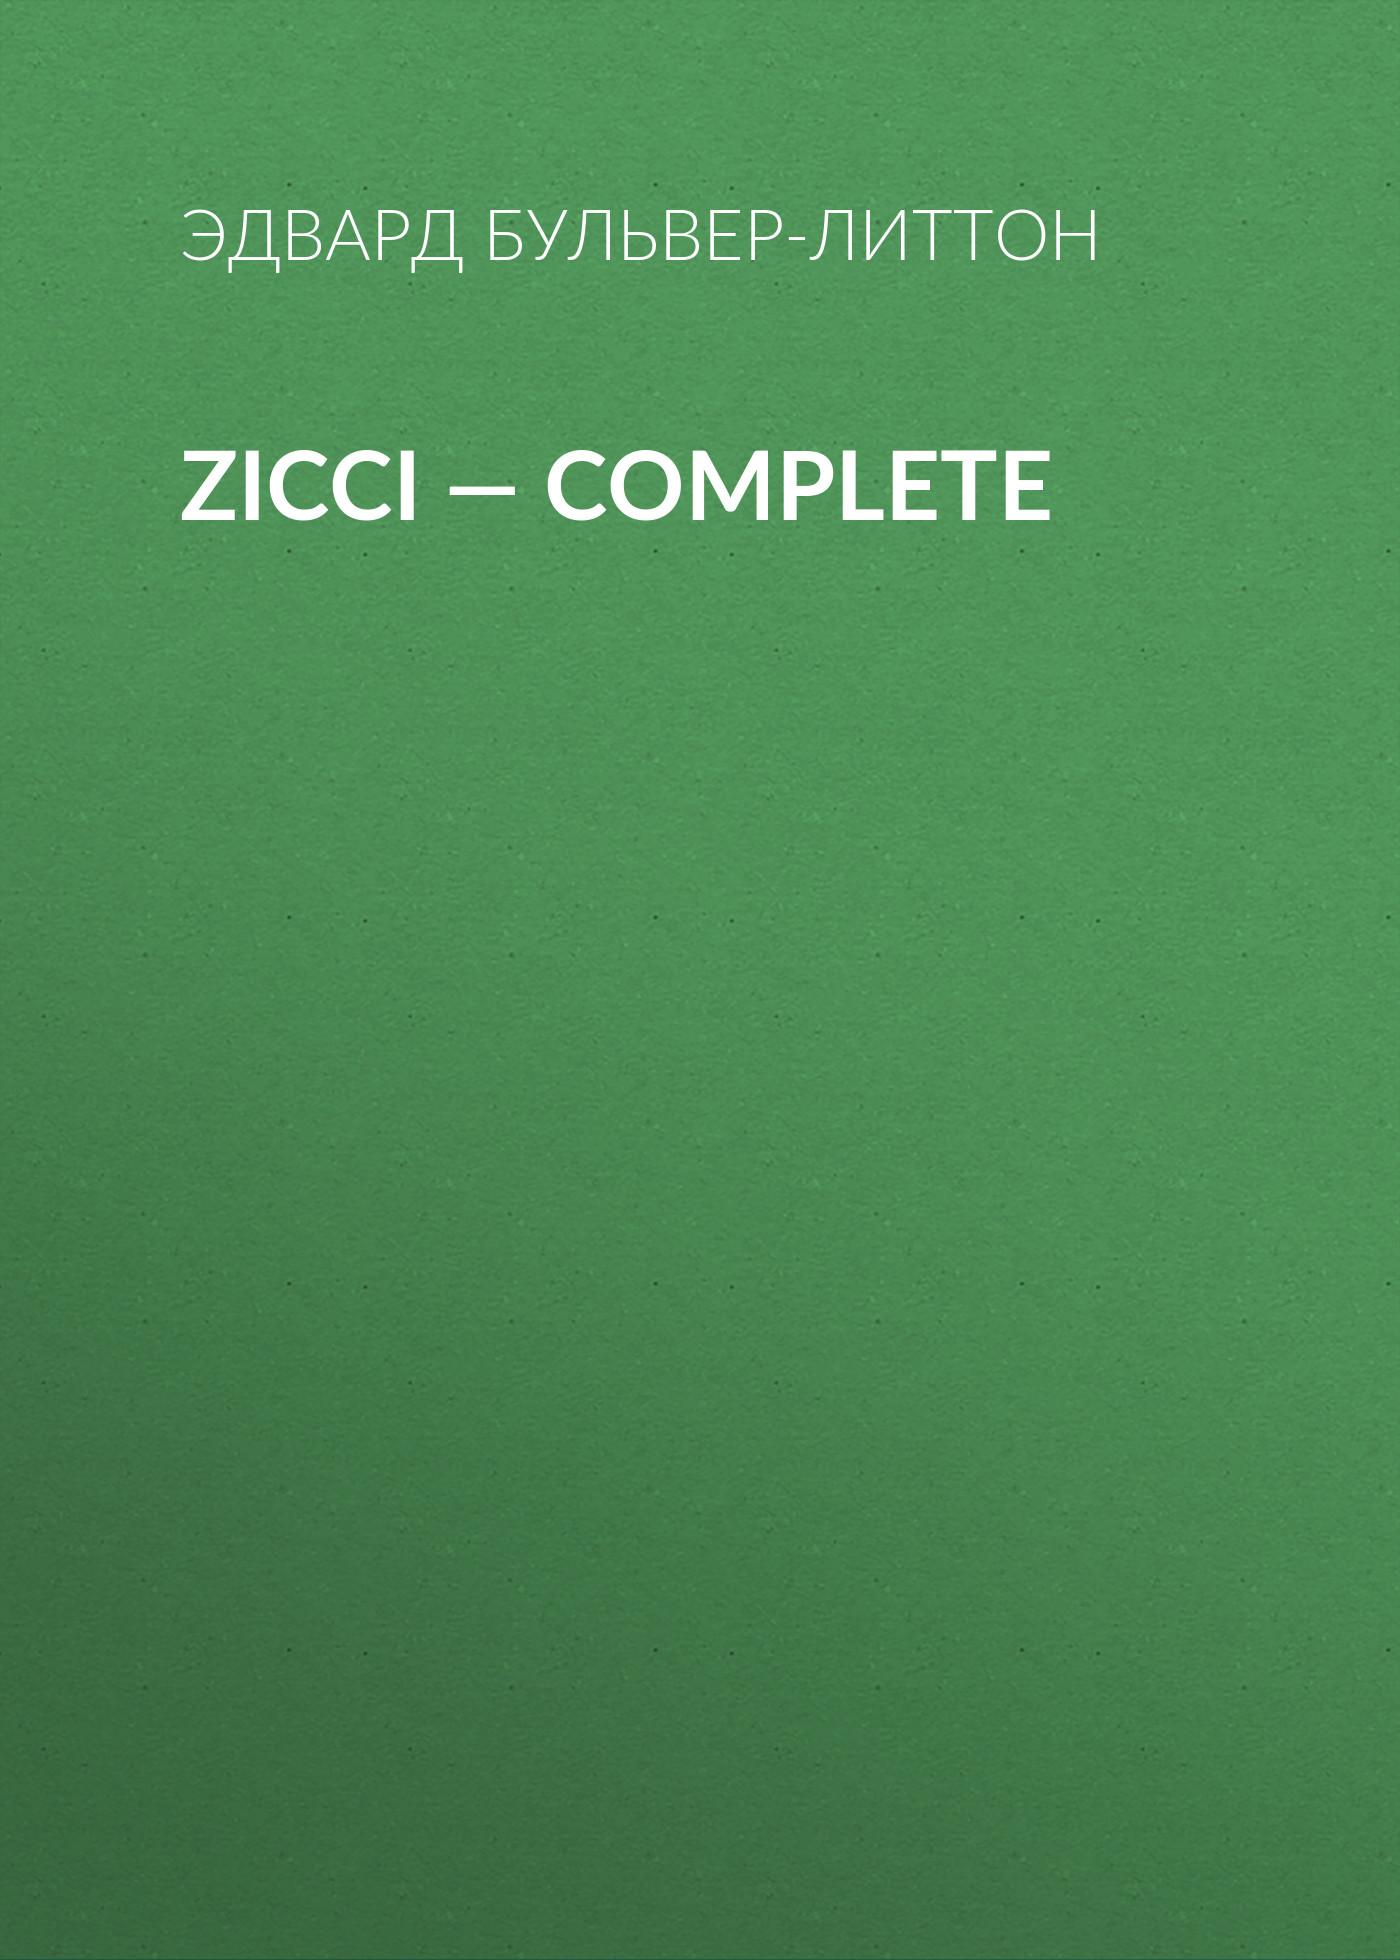 Zicci — Complete